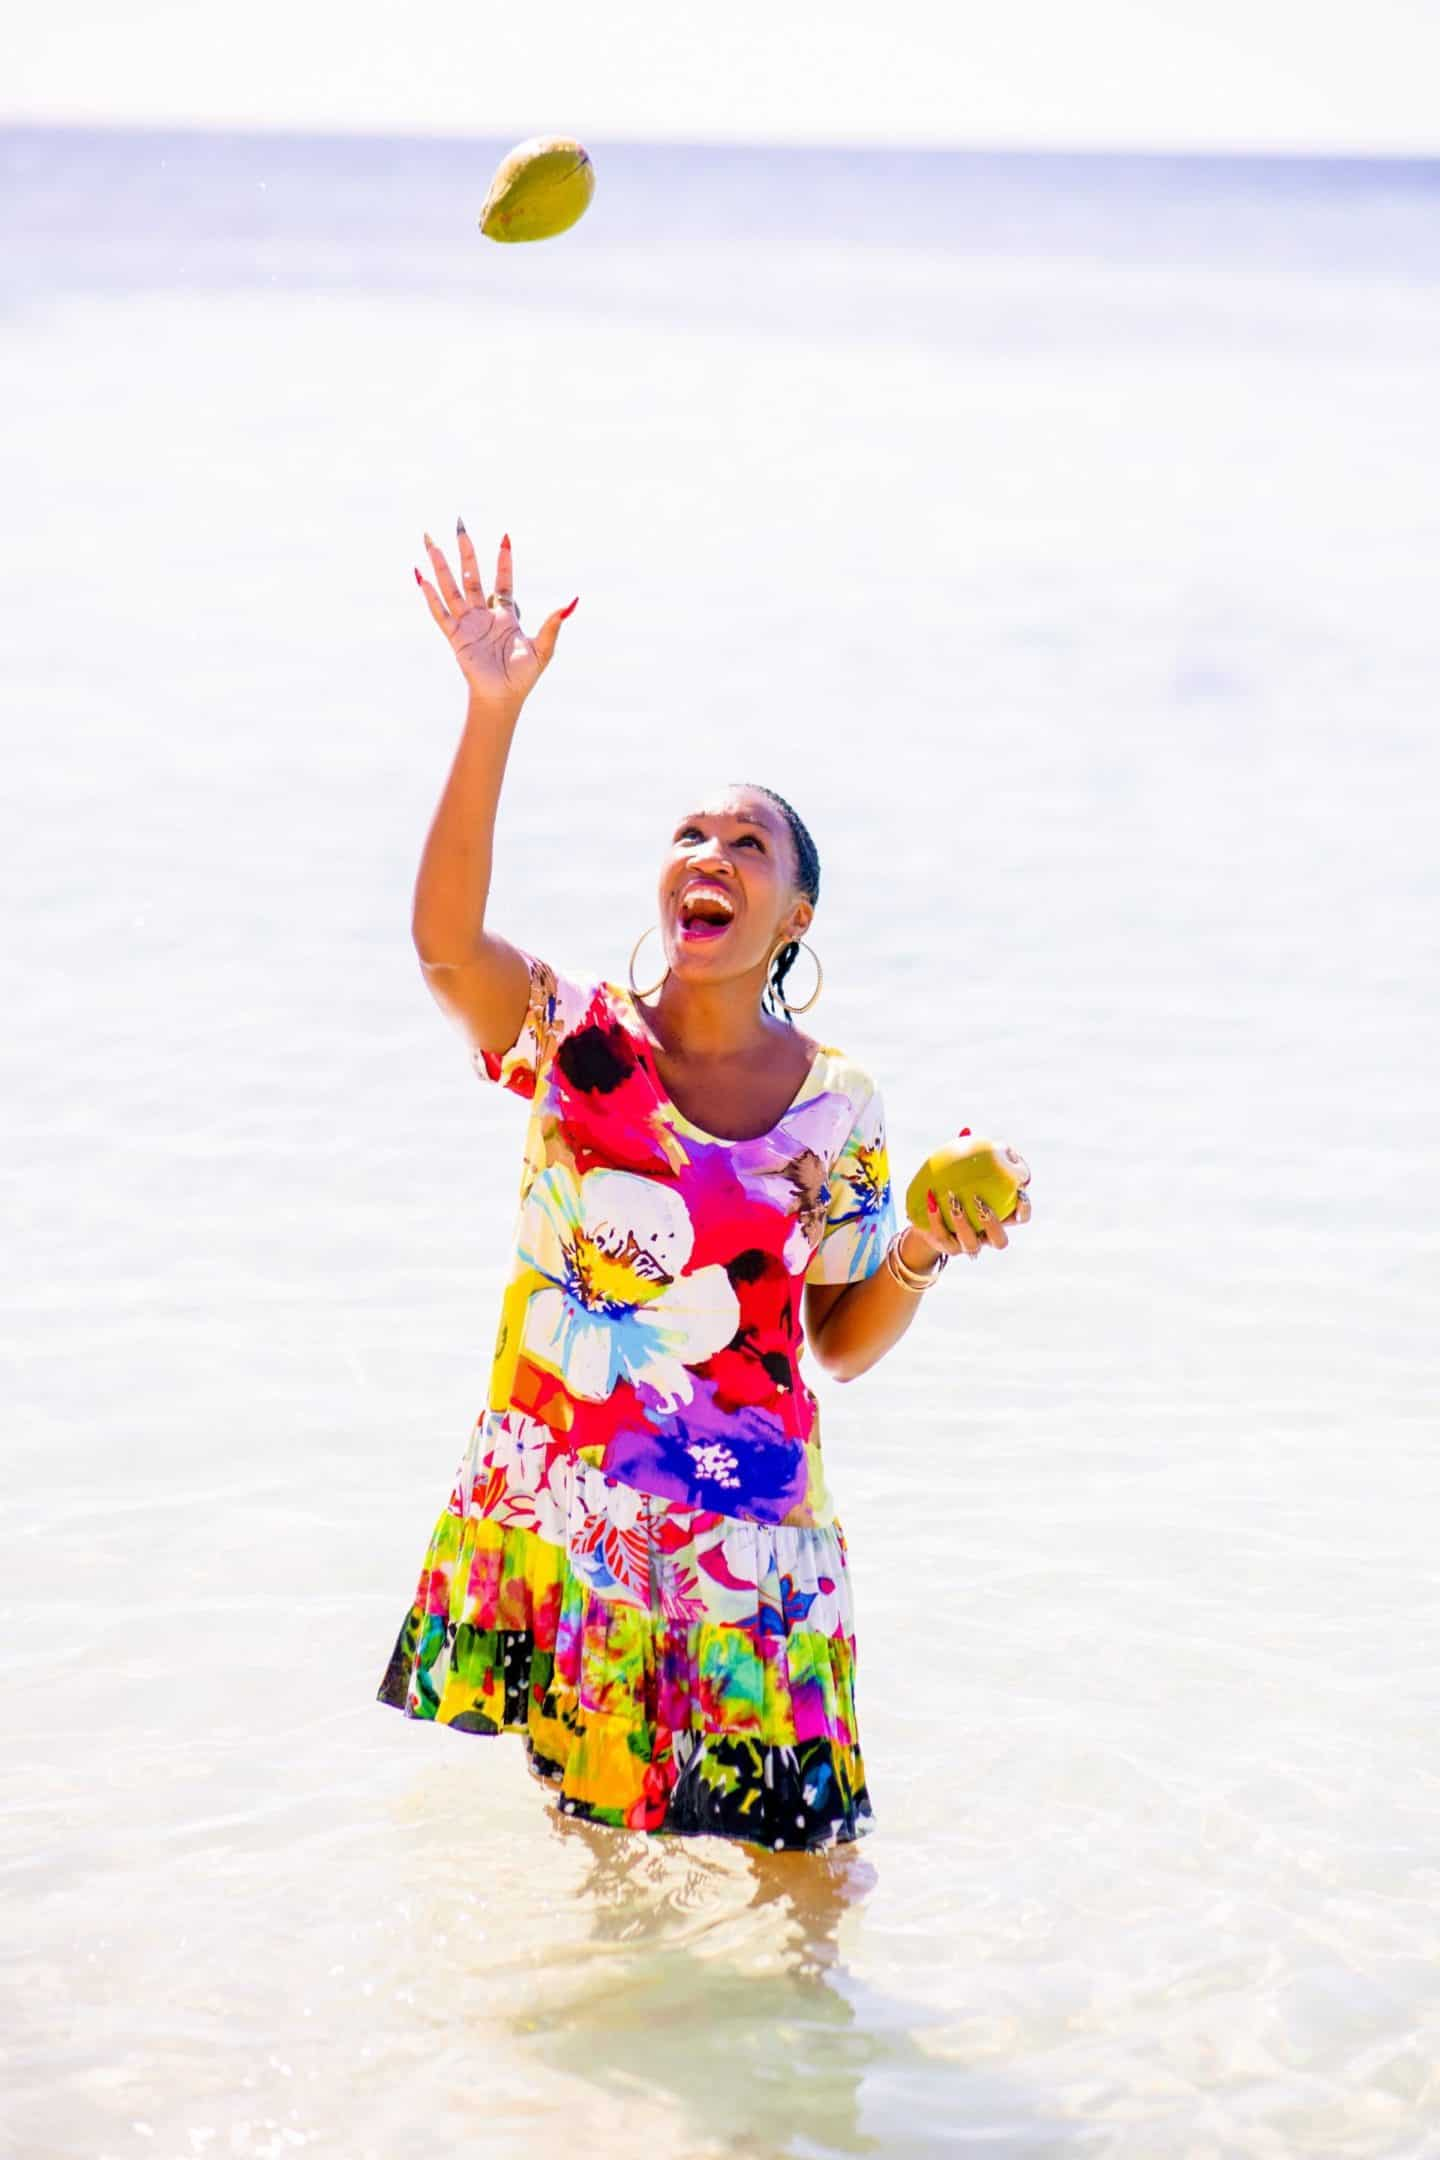 Shaunda Necole- Juggling coconuts on the beach in Honduras! Carnival Cruise Line - Vista - land excursion